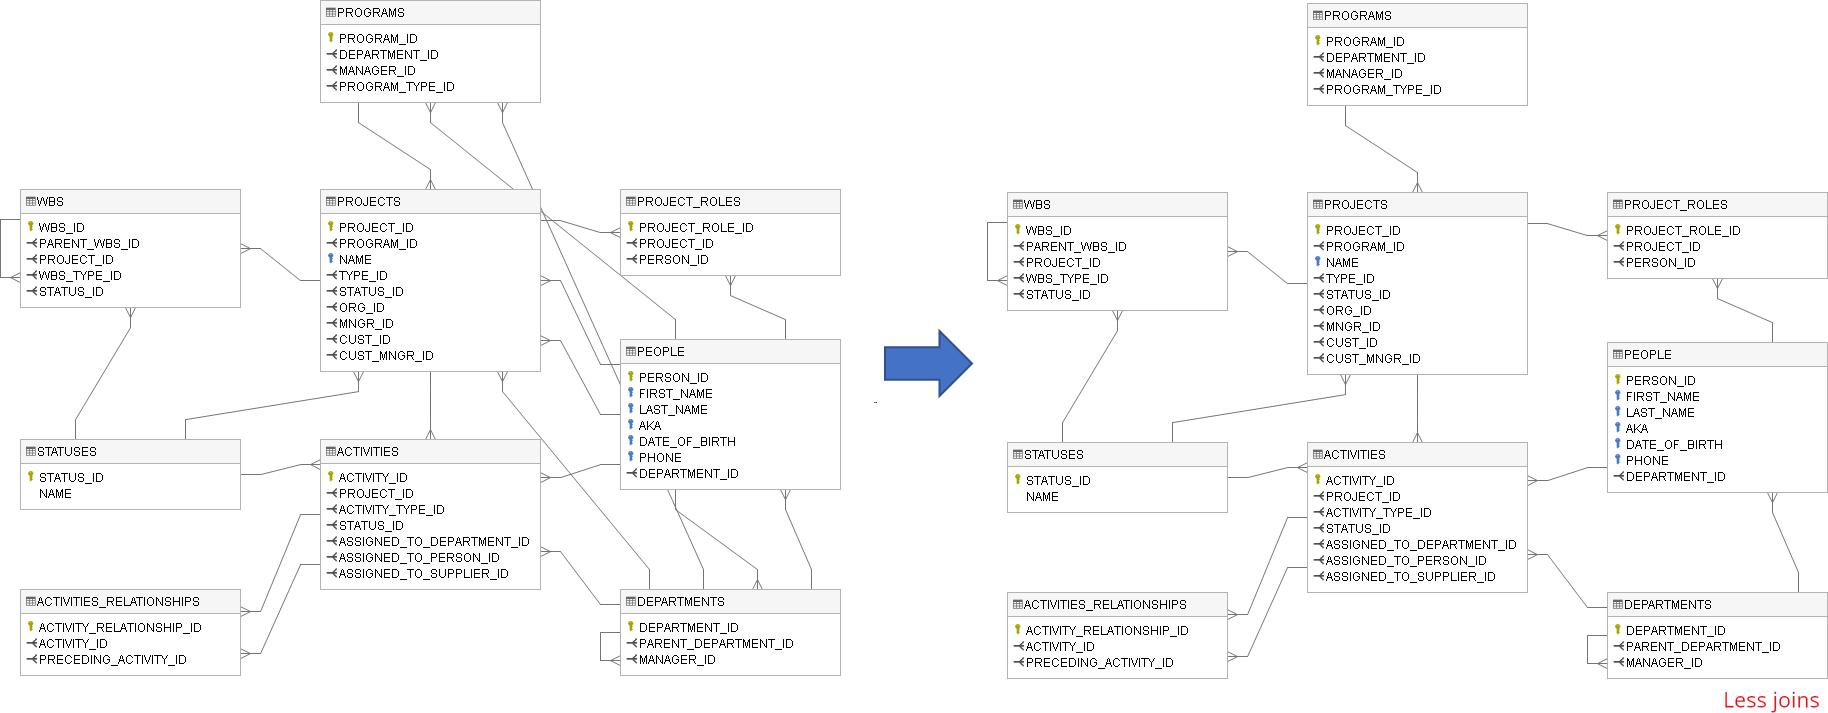 Create Er Diagram For Existing Database - Dataedo Dataedo throughout Er Diagram Left Join